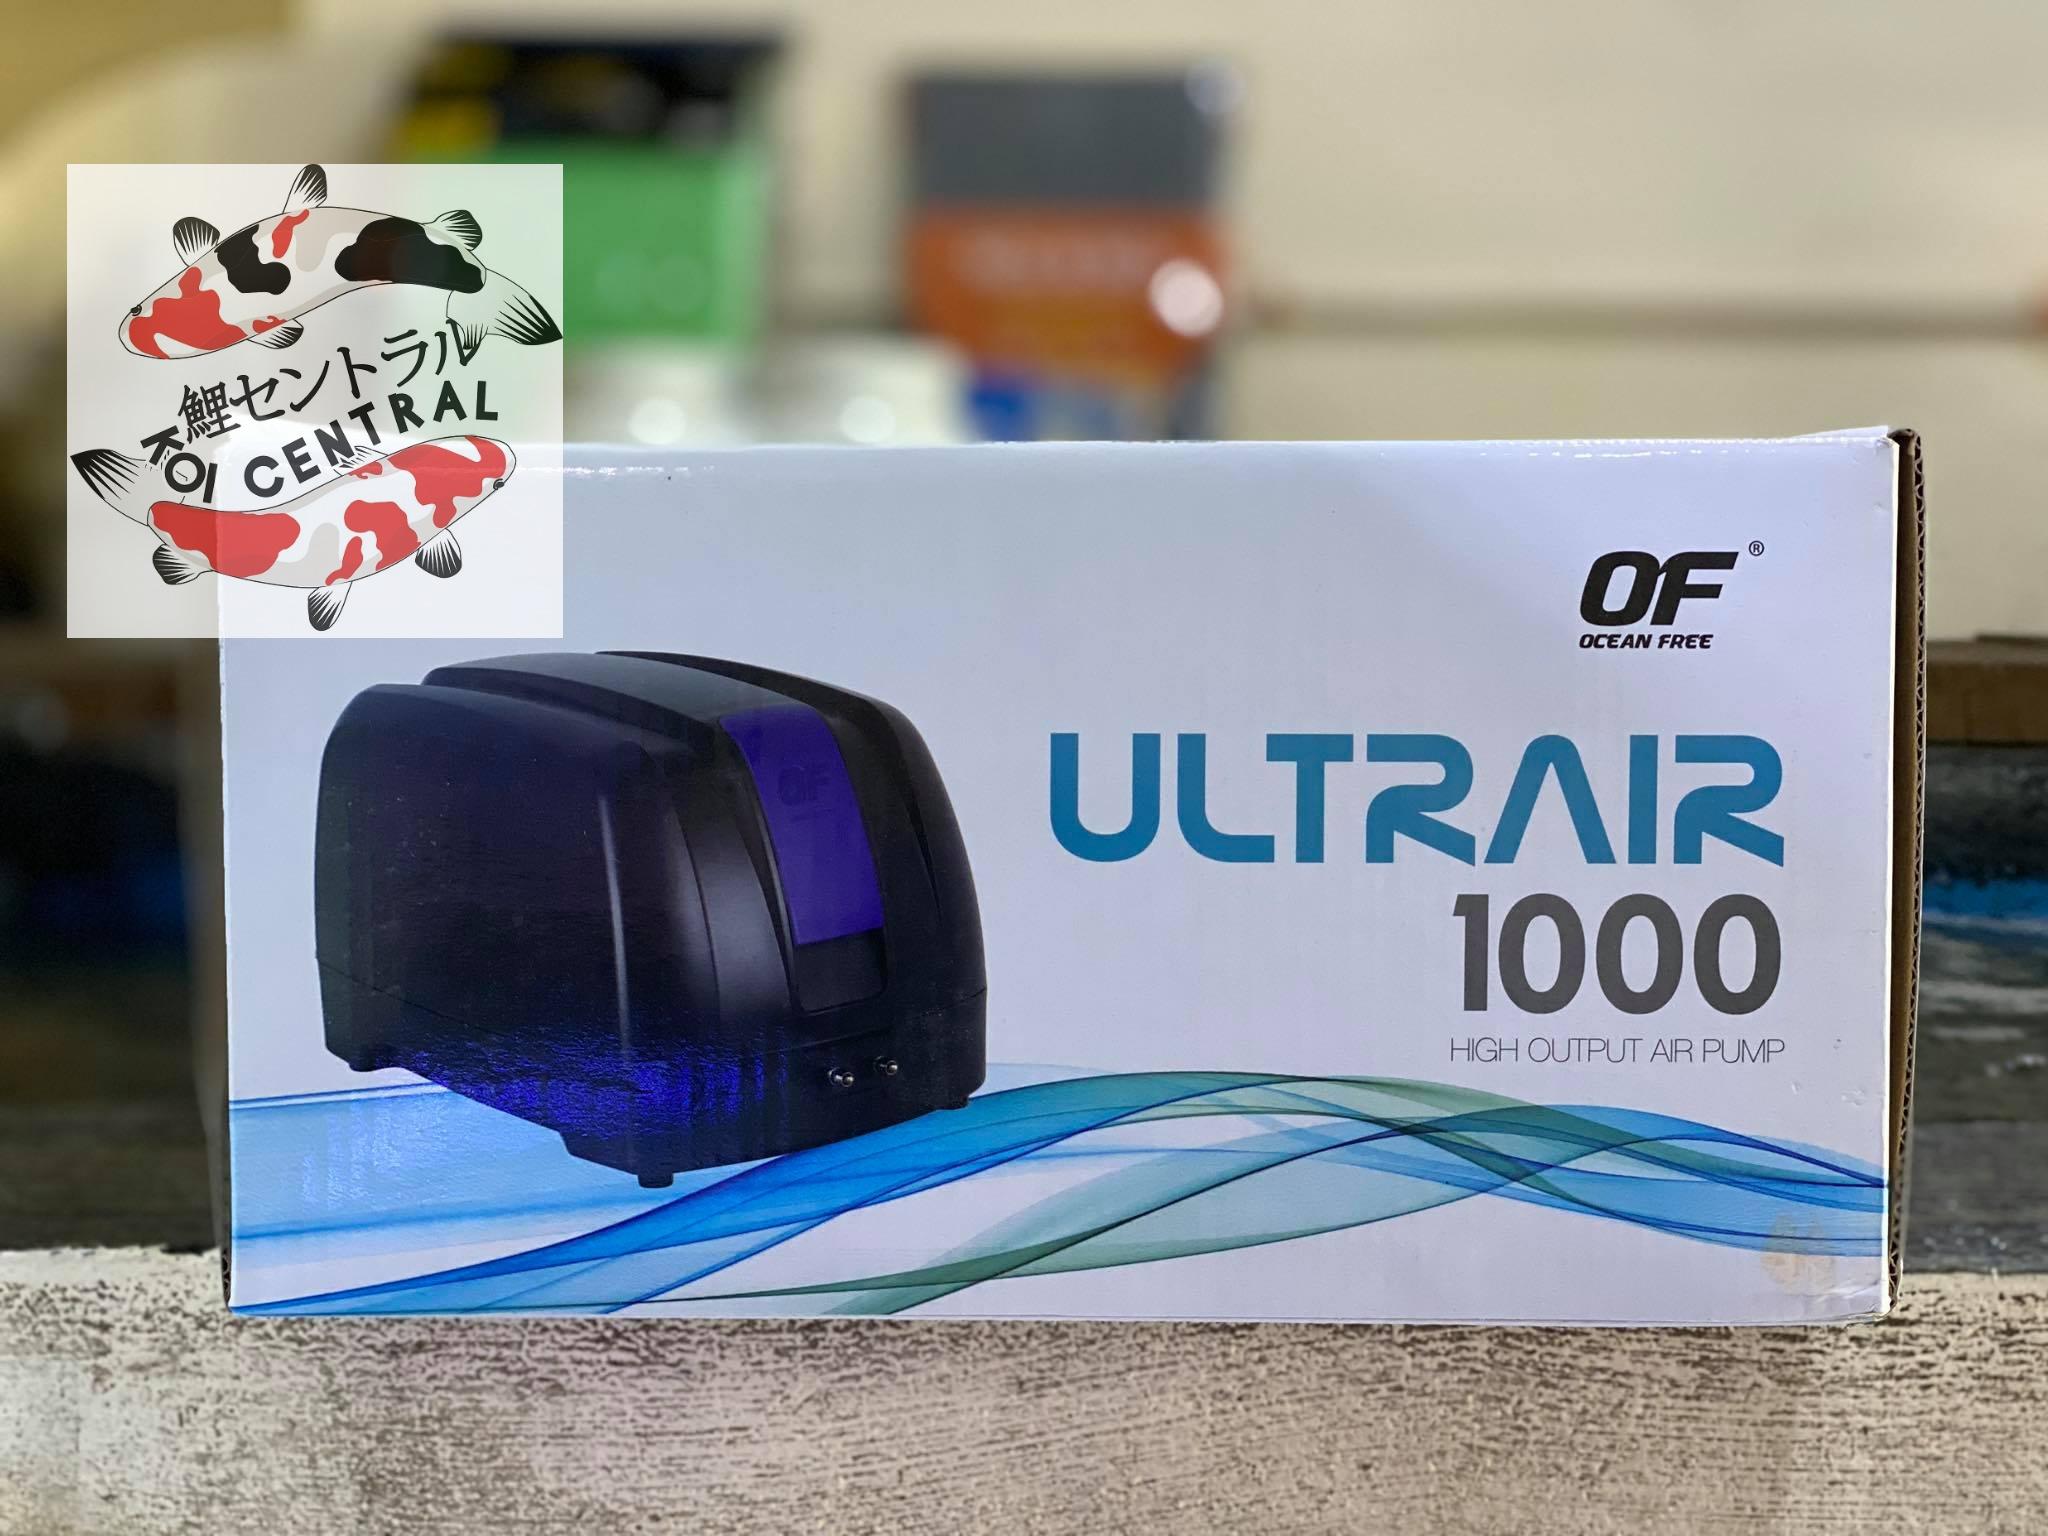 Ocean Free Ultrair 1000 Airpump Buy Sell Online Air Pumps Accessories With Cheap Price Lazada Ph